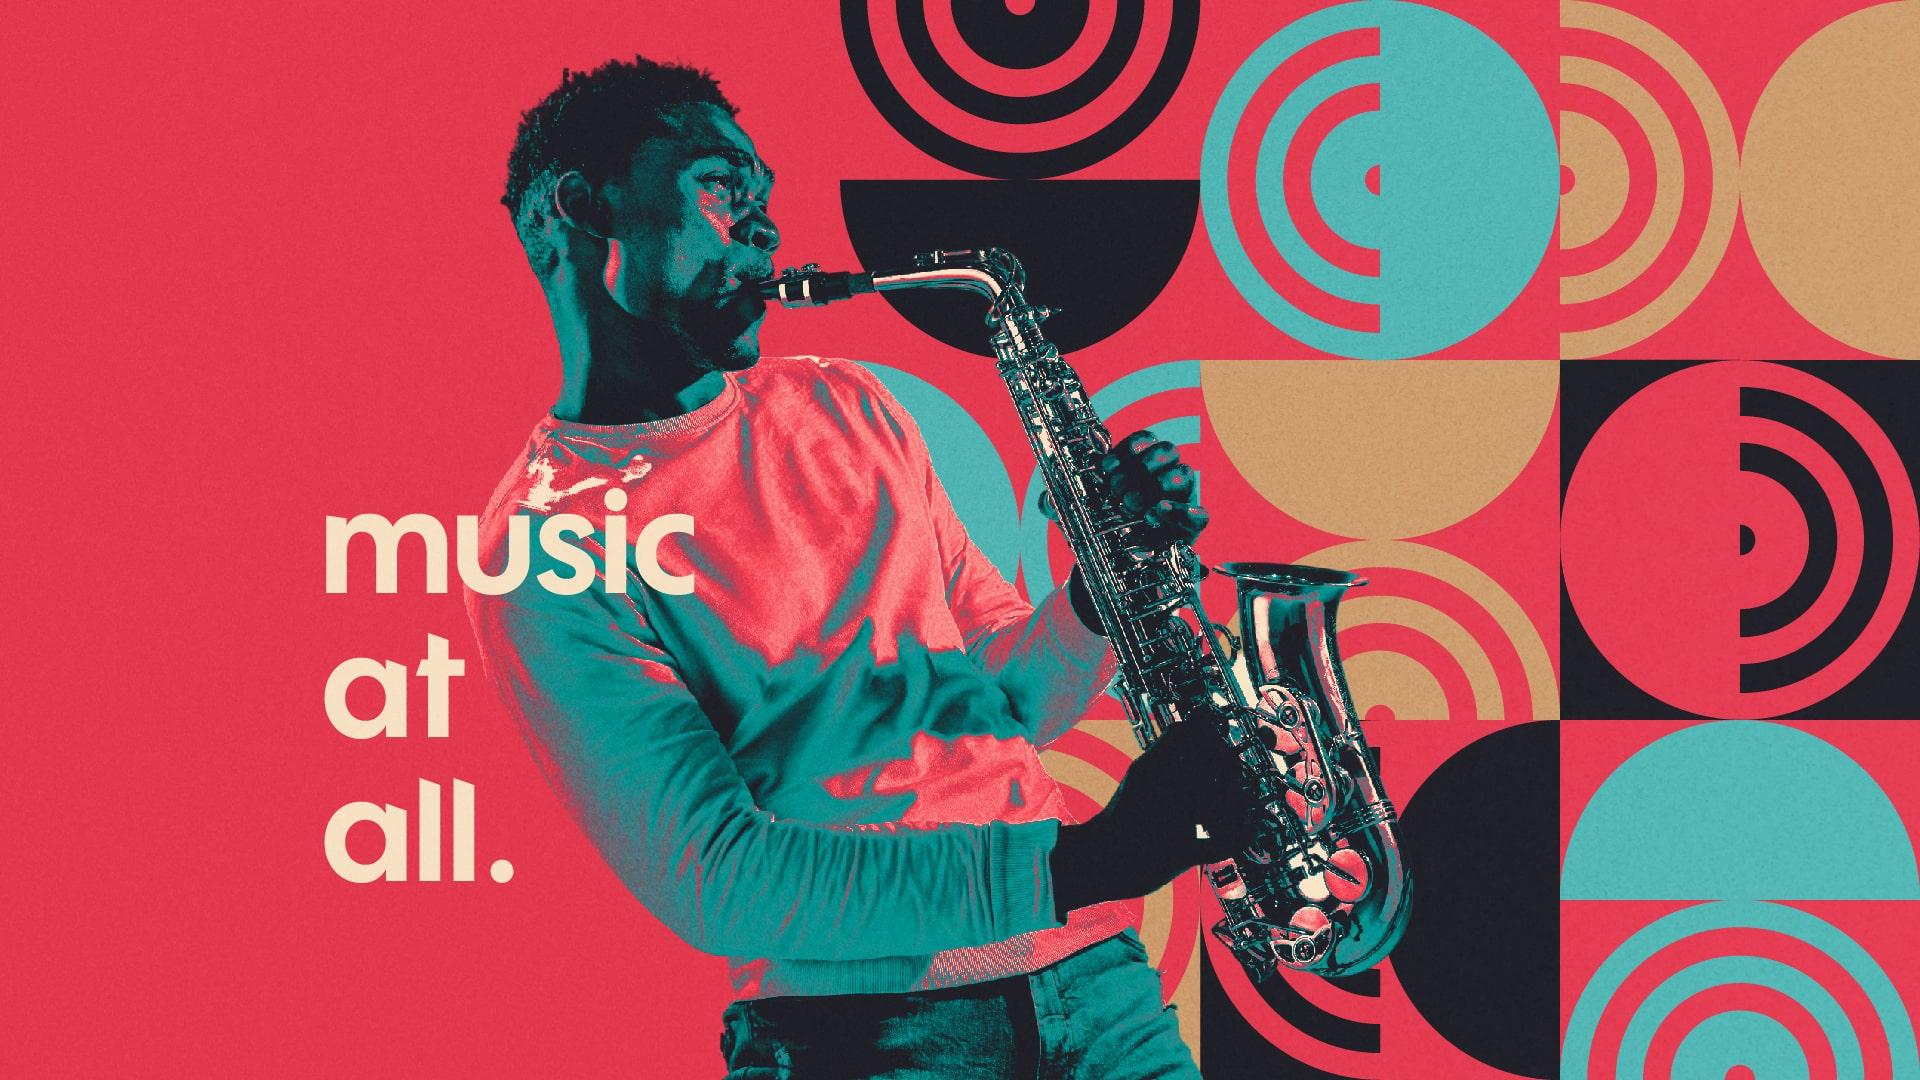 Matheus Ferreira Creates Branding for a Music School Deejay's